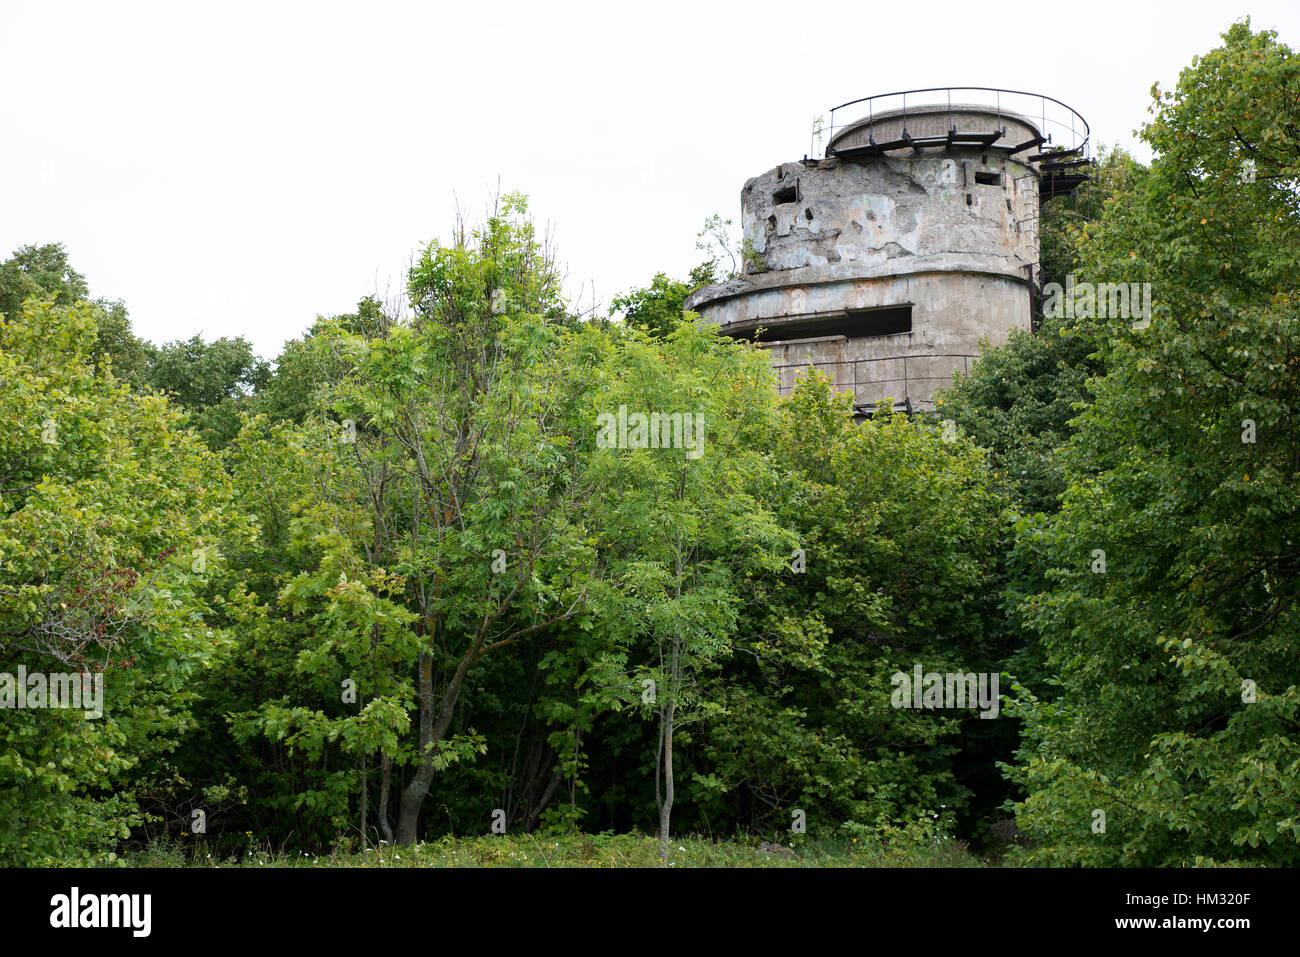 Abandoned defensive tower, Paldiski former naval base area, Pakri Peninsula, Harju County, Estonia - Stock Image